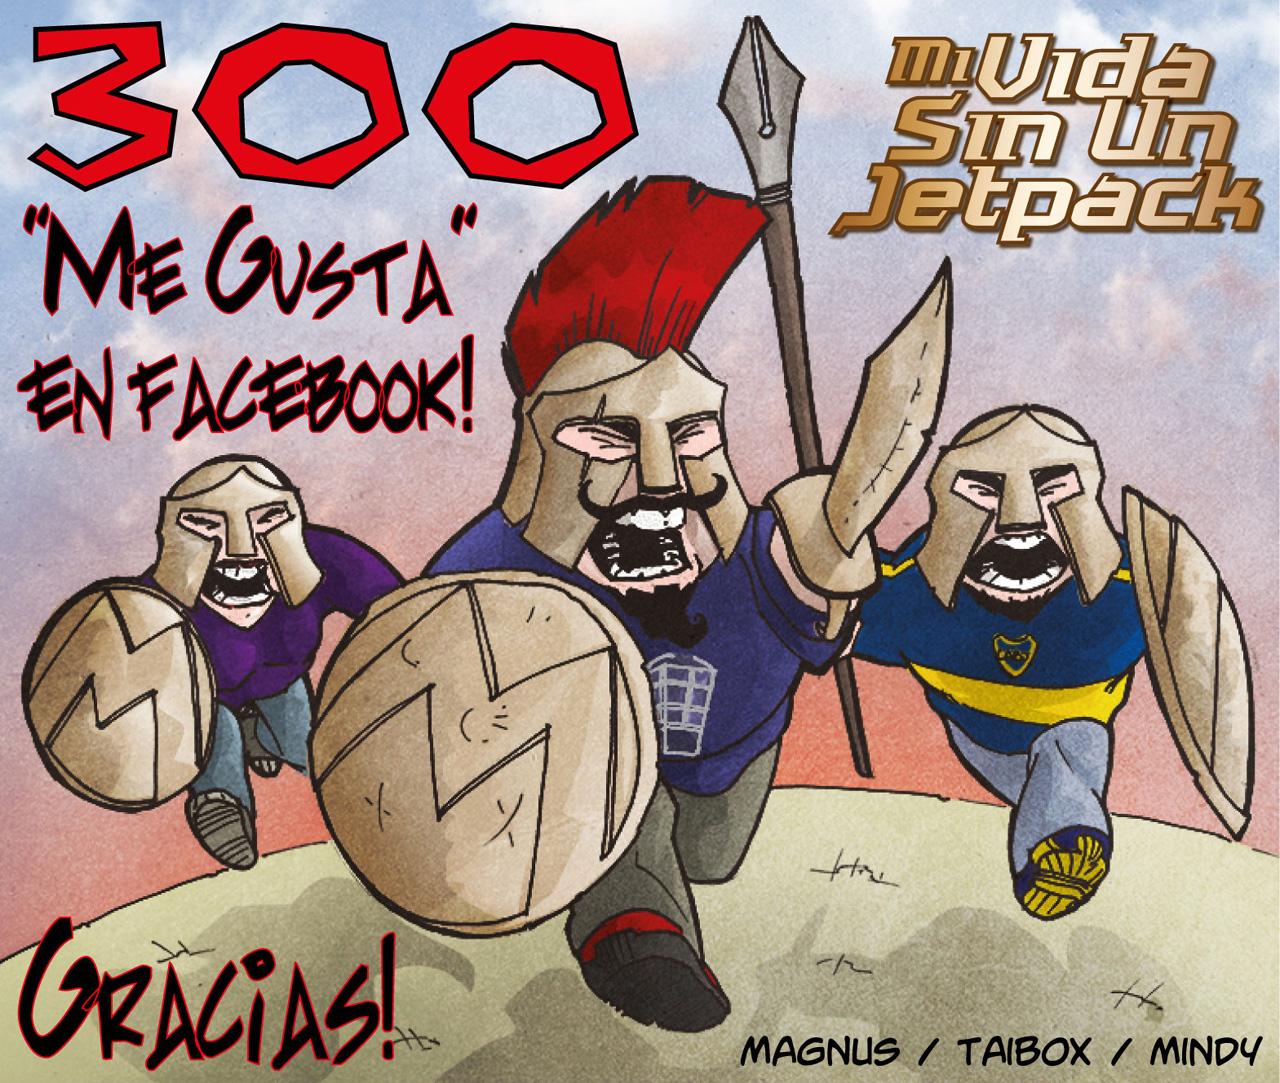 300 Fans En Facebook!